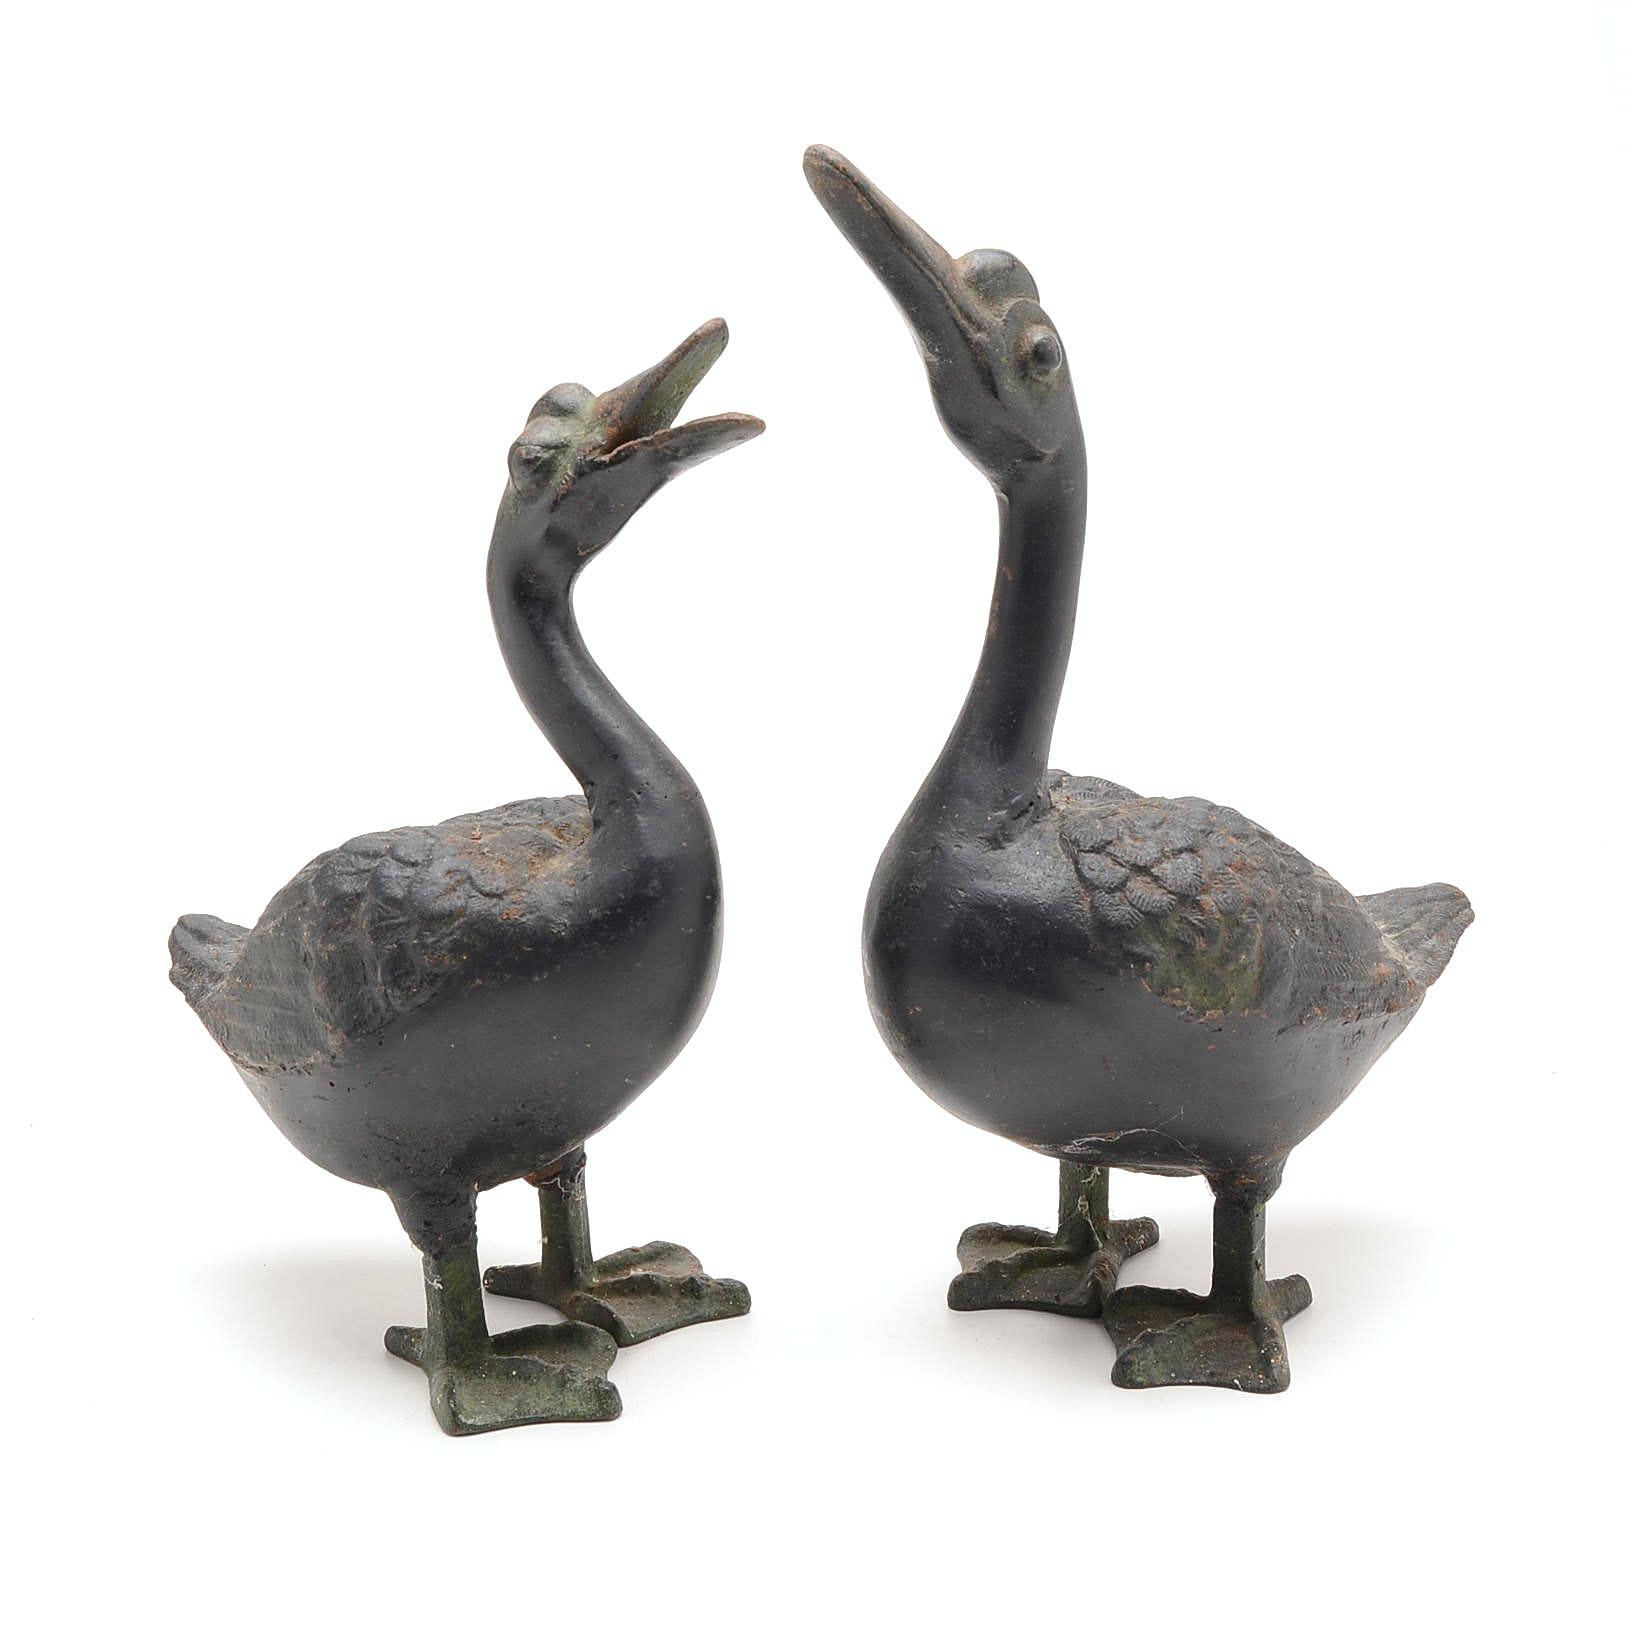 Pair of Cast Iron Duck Sculptures